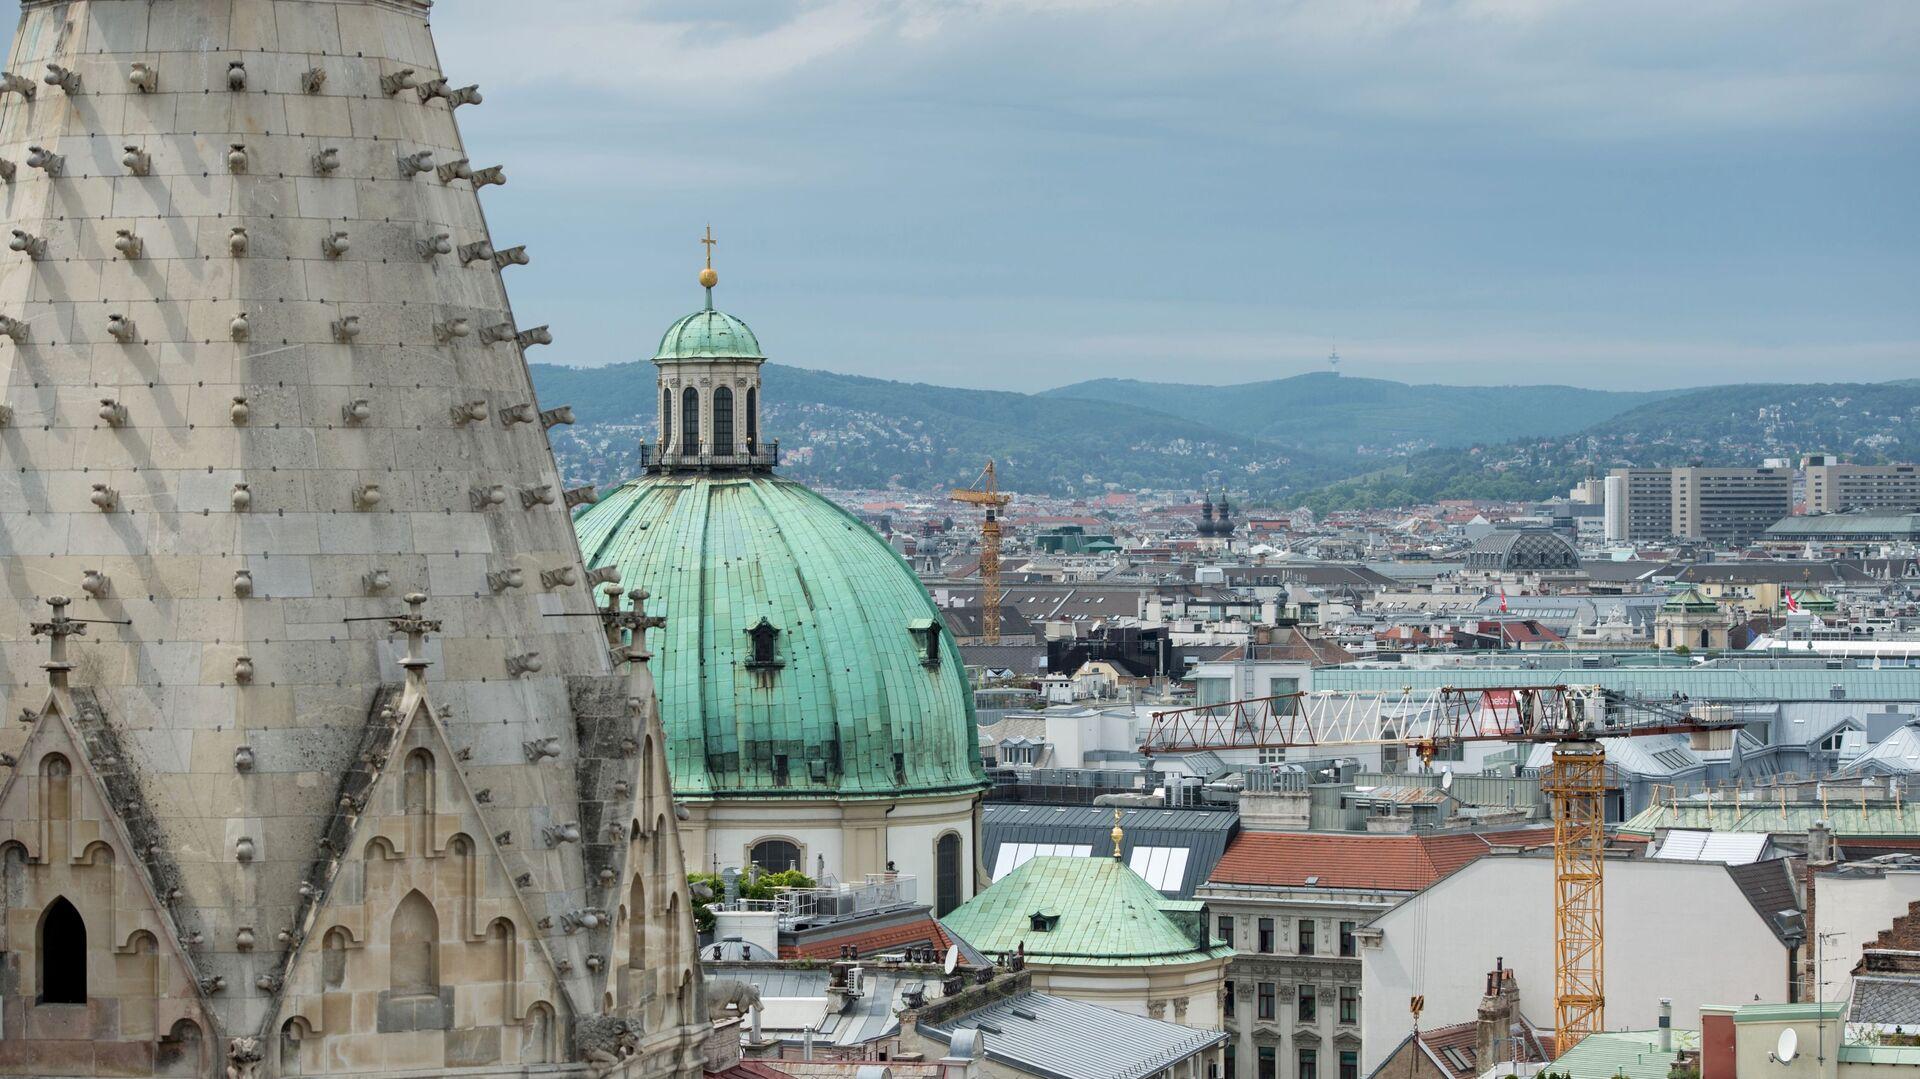 Viena, la capital de Austria (imagen referencial) - Sputnik Mundo, 1920, 19.07.2021